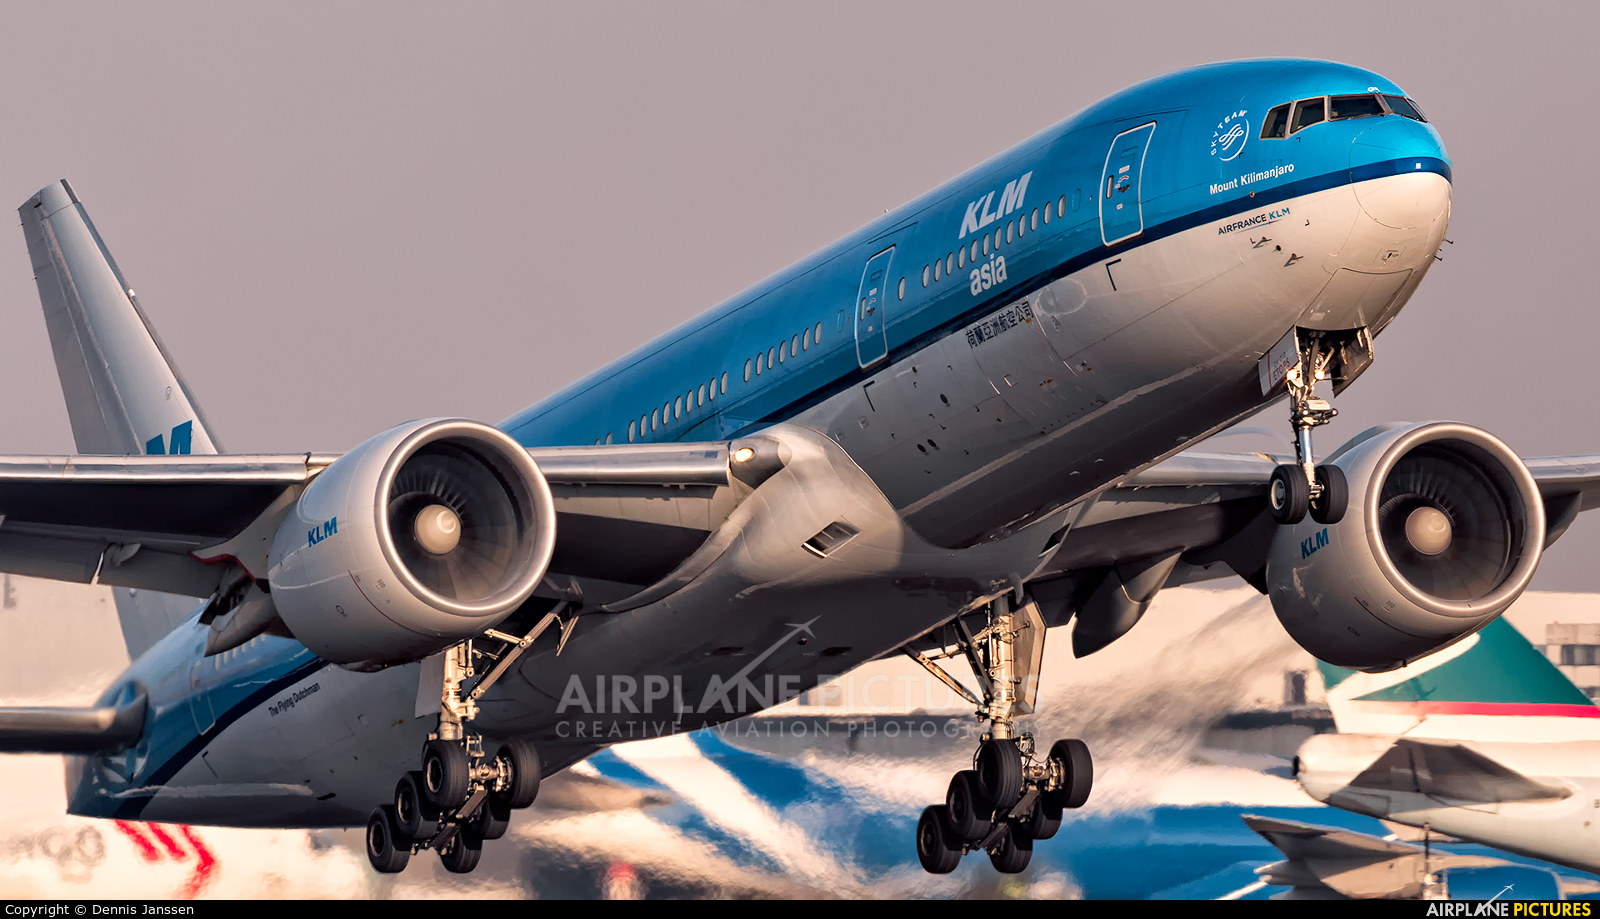 KLM Asia PH-BQK aircraft at Amsterdam - Schiphol